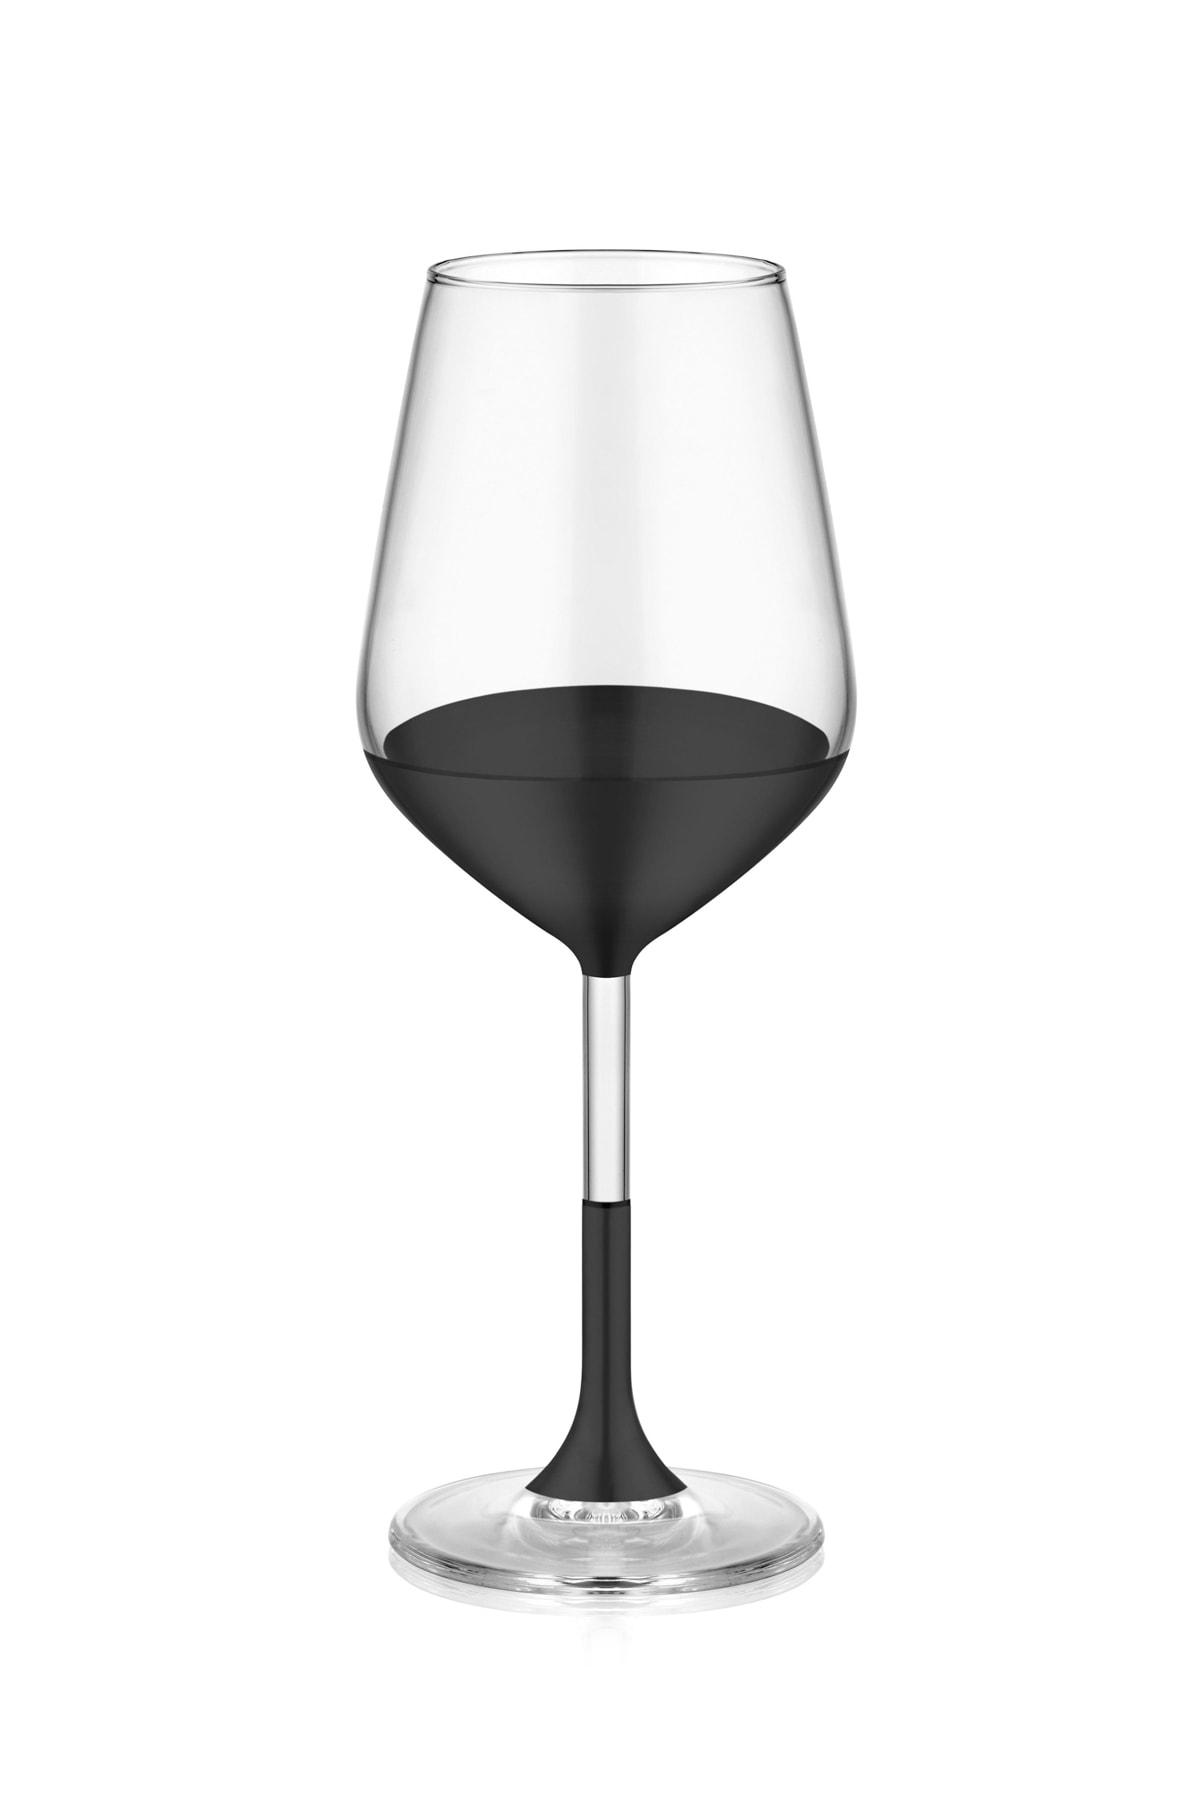 The Mia Dark Şarap Kadehi 6'lı Set 2